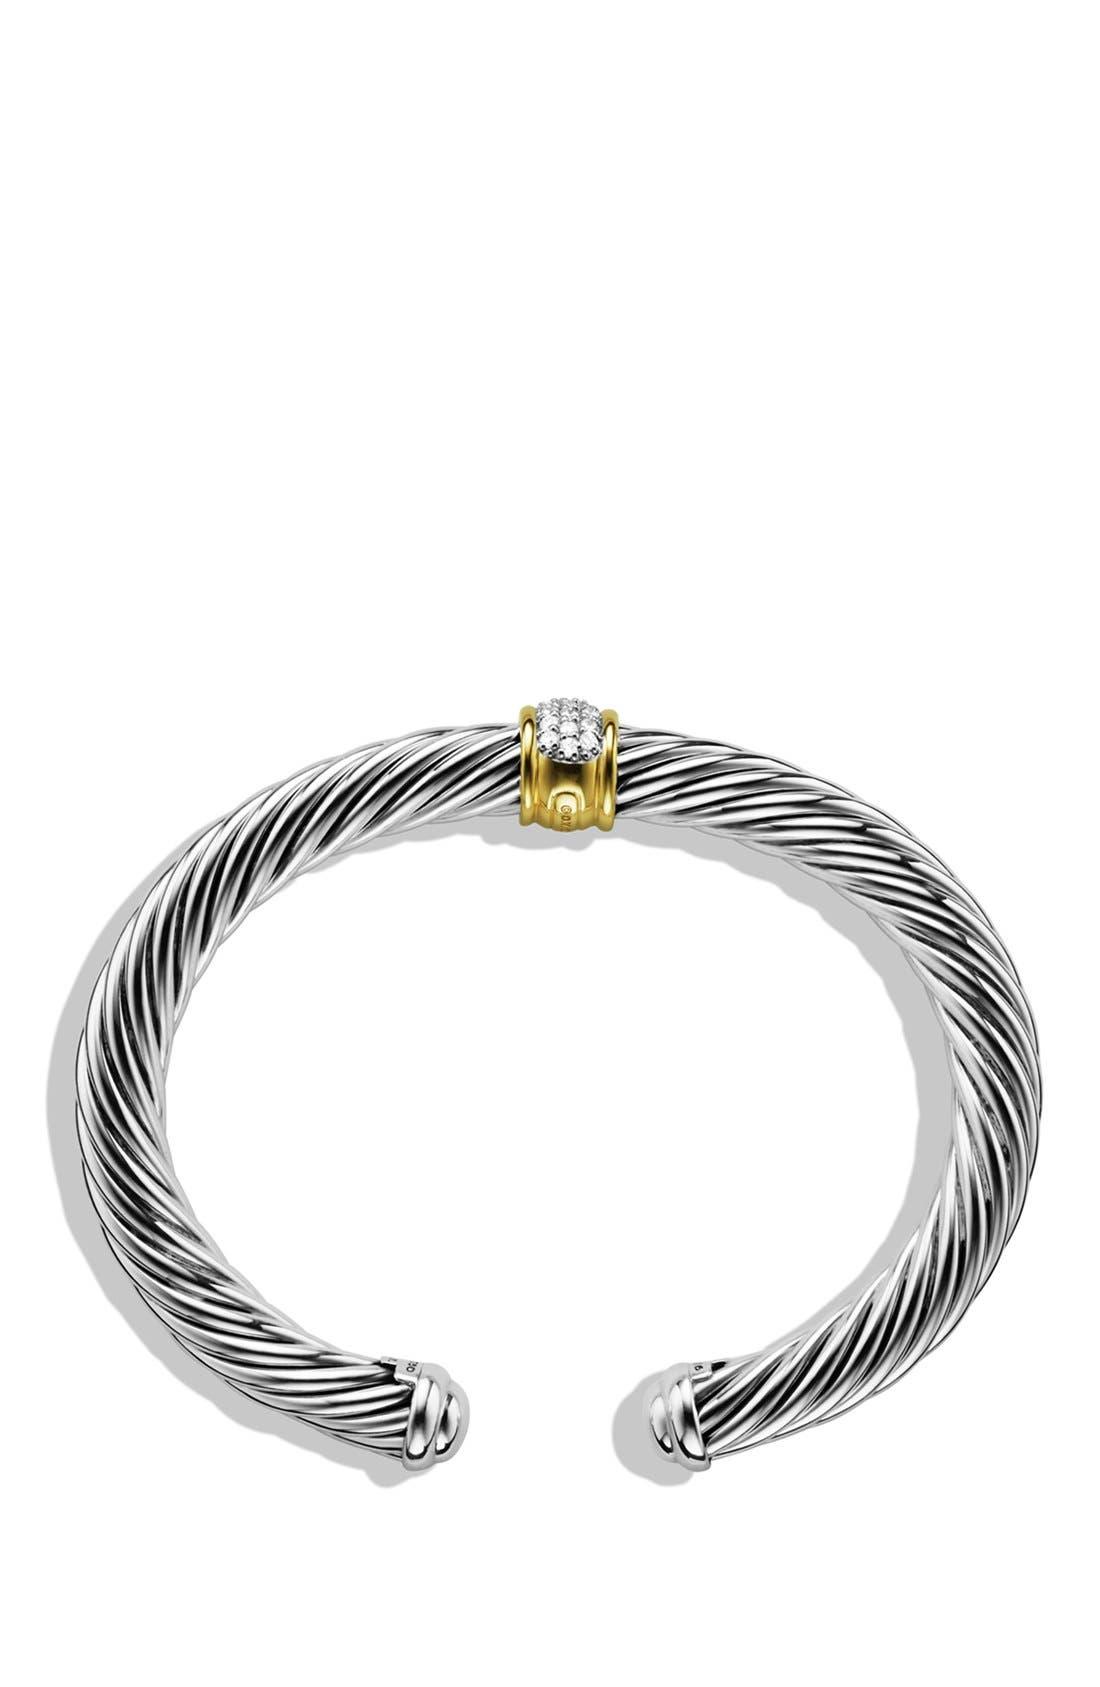 Alternate Image 2  - David Yurman 'Cable Classics' Bracelet with Diamonds and Gold